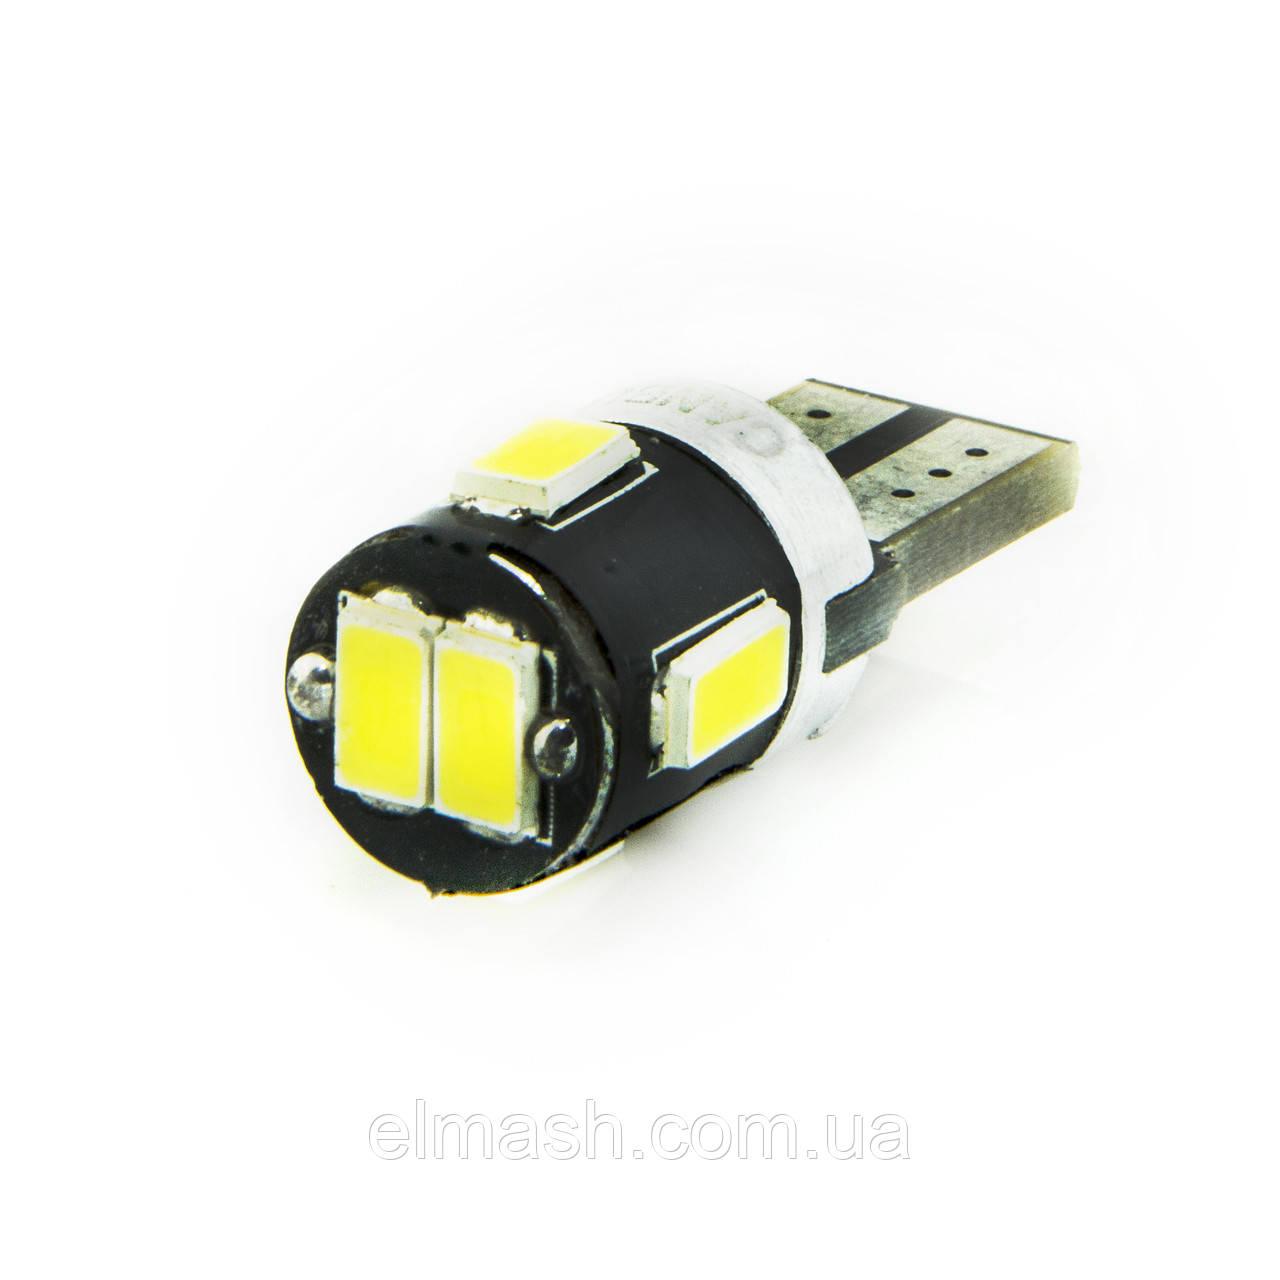 Лампа LED 12V T10 (W5W) 6SMD 5630 обманка 240Lm БЕЛЫЙ